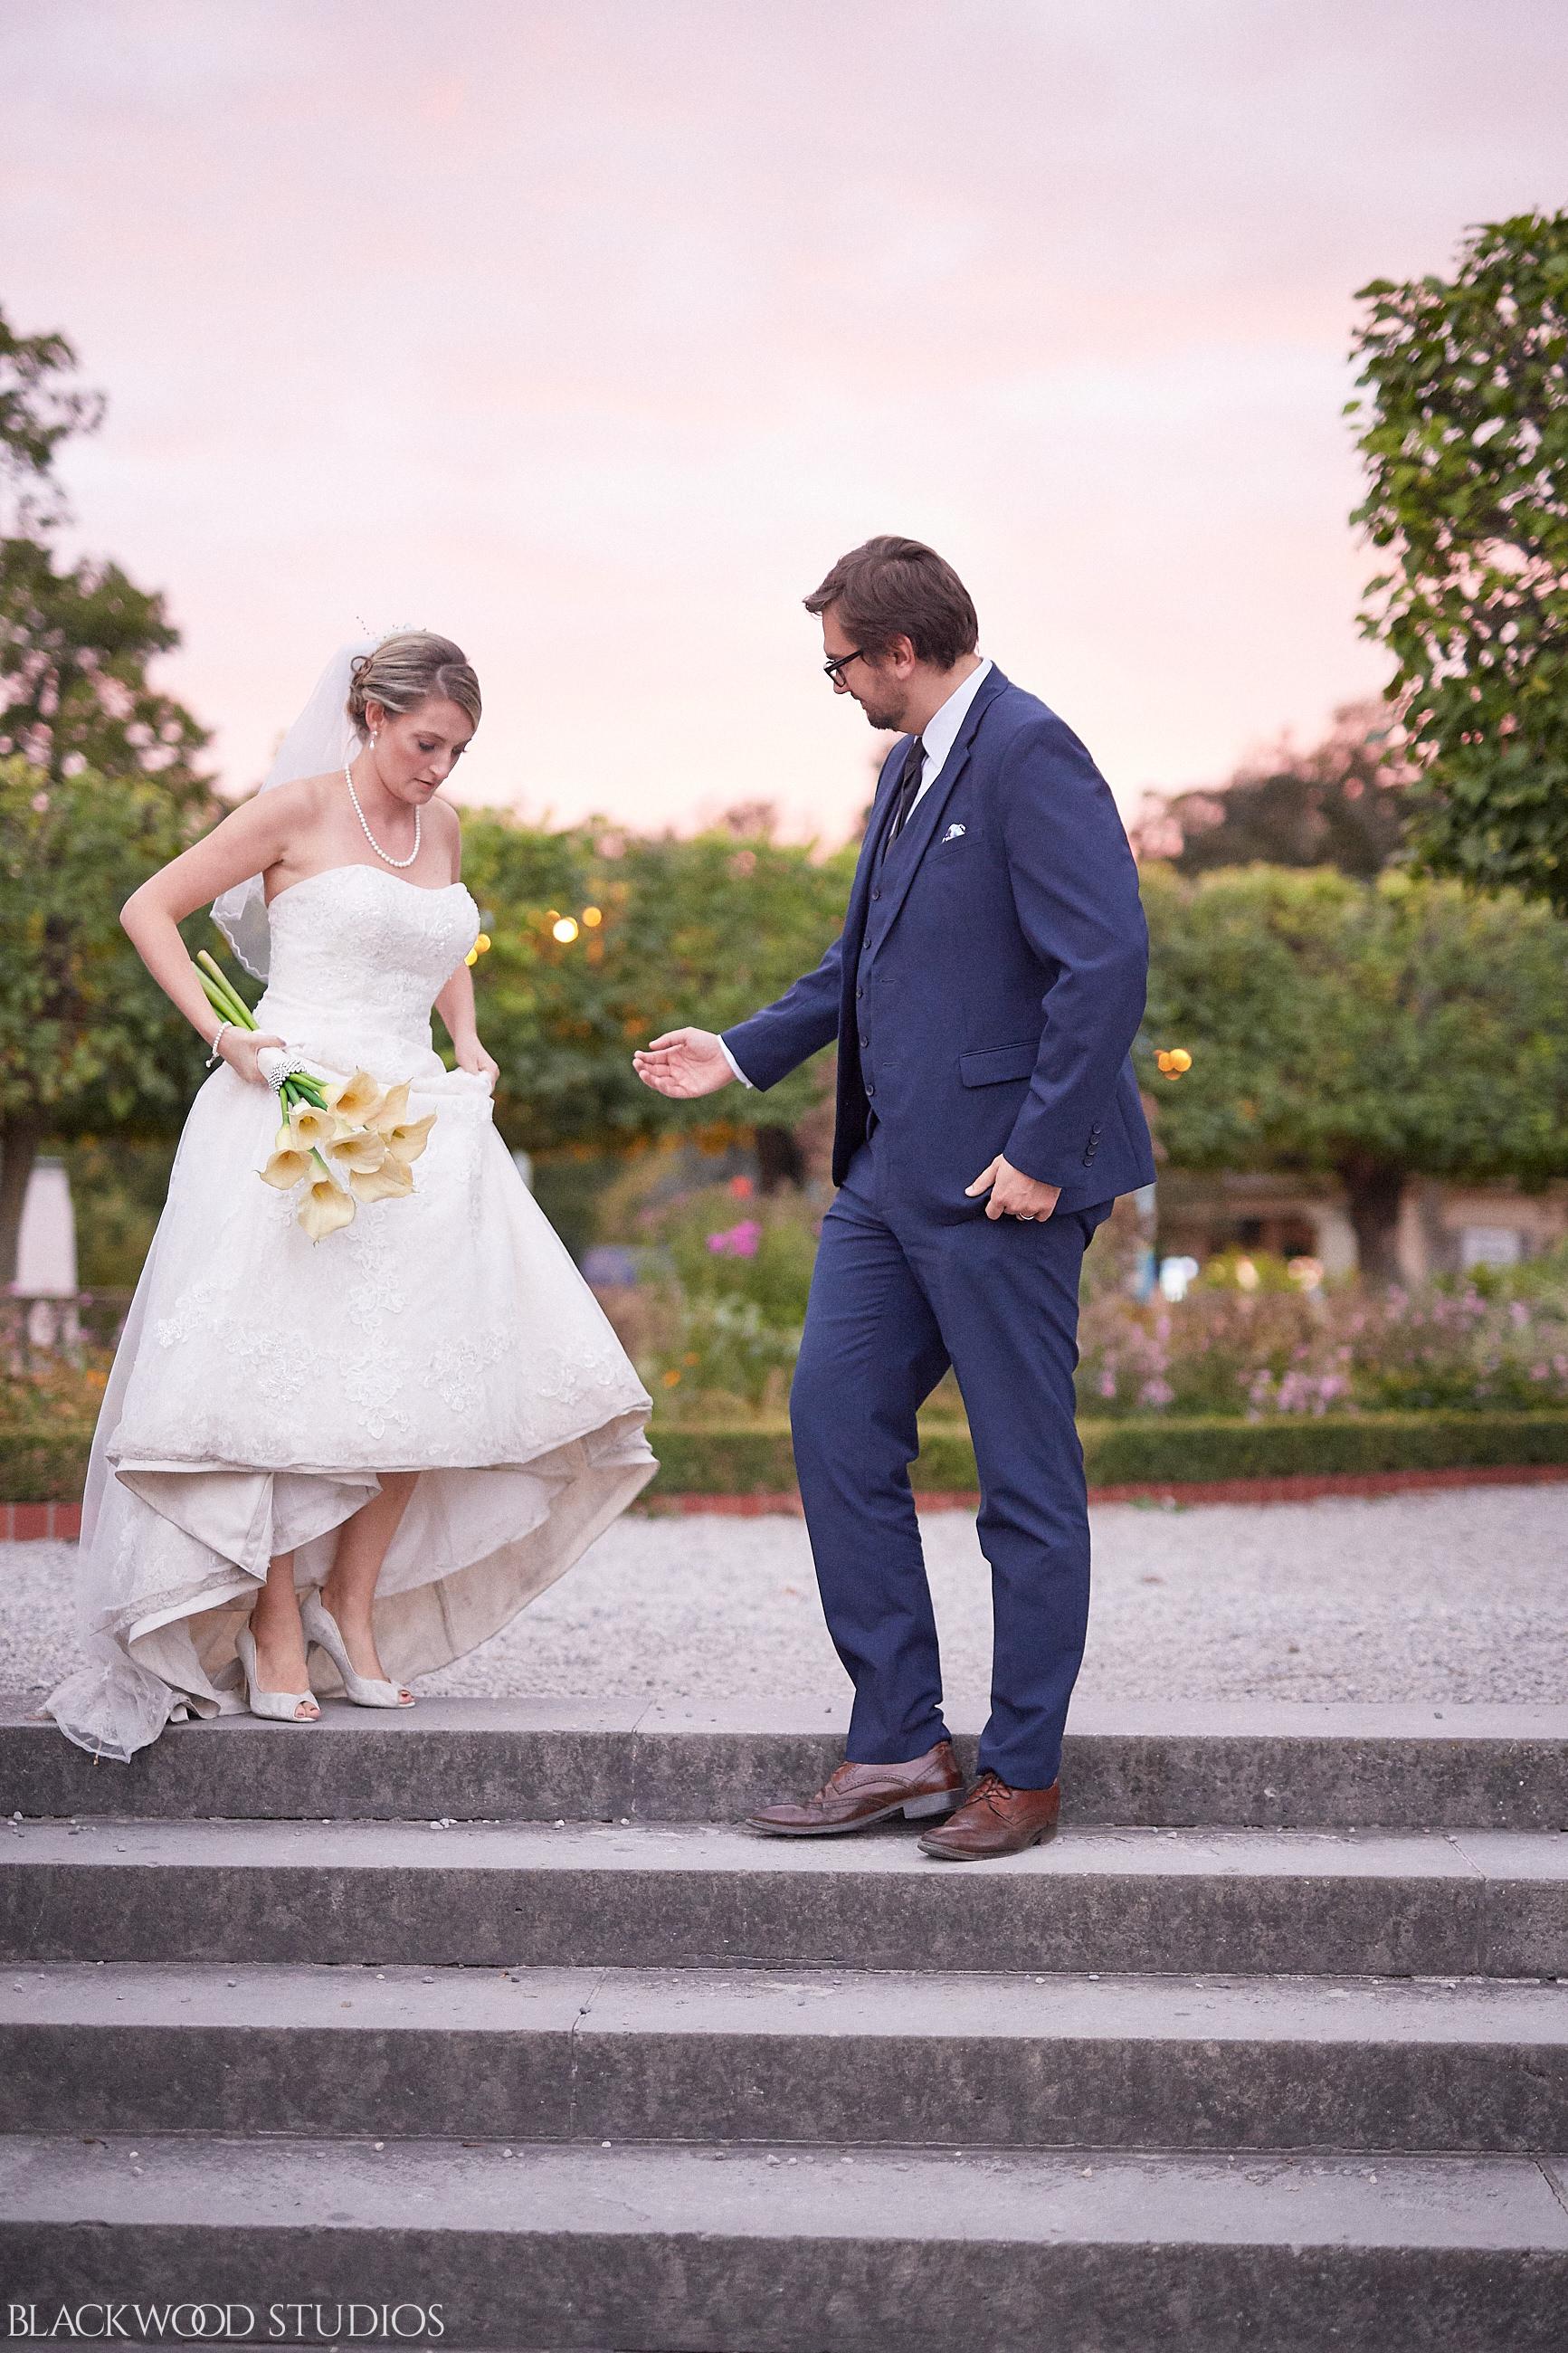 Blackwood-Studios-Wedding-Photography-20170928-190128-Marek-Katie-Michalek-Oakes-Garden-Theatre-Niagara-Falls-Ontario-Canada.jpg